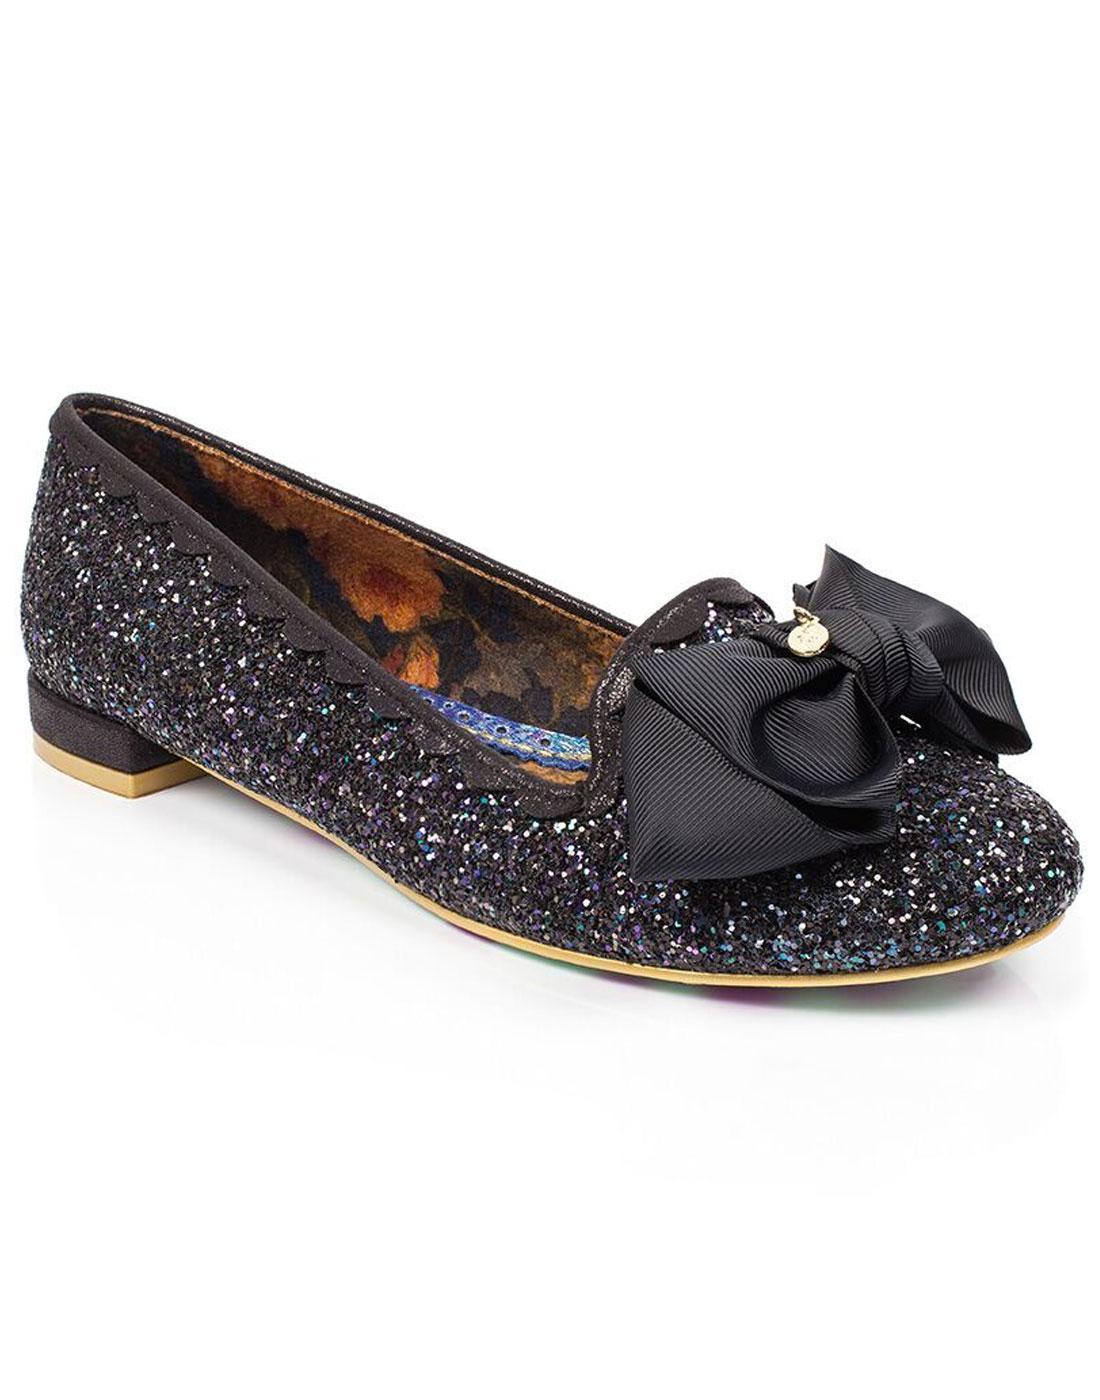 Sulu IRREGULAR CHOICE Retro 50s Glitter Bow Flats